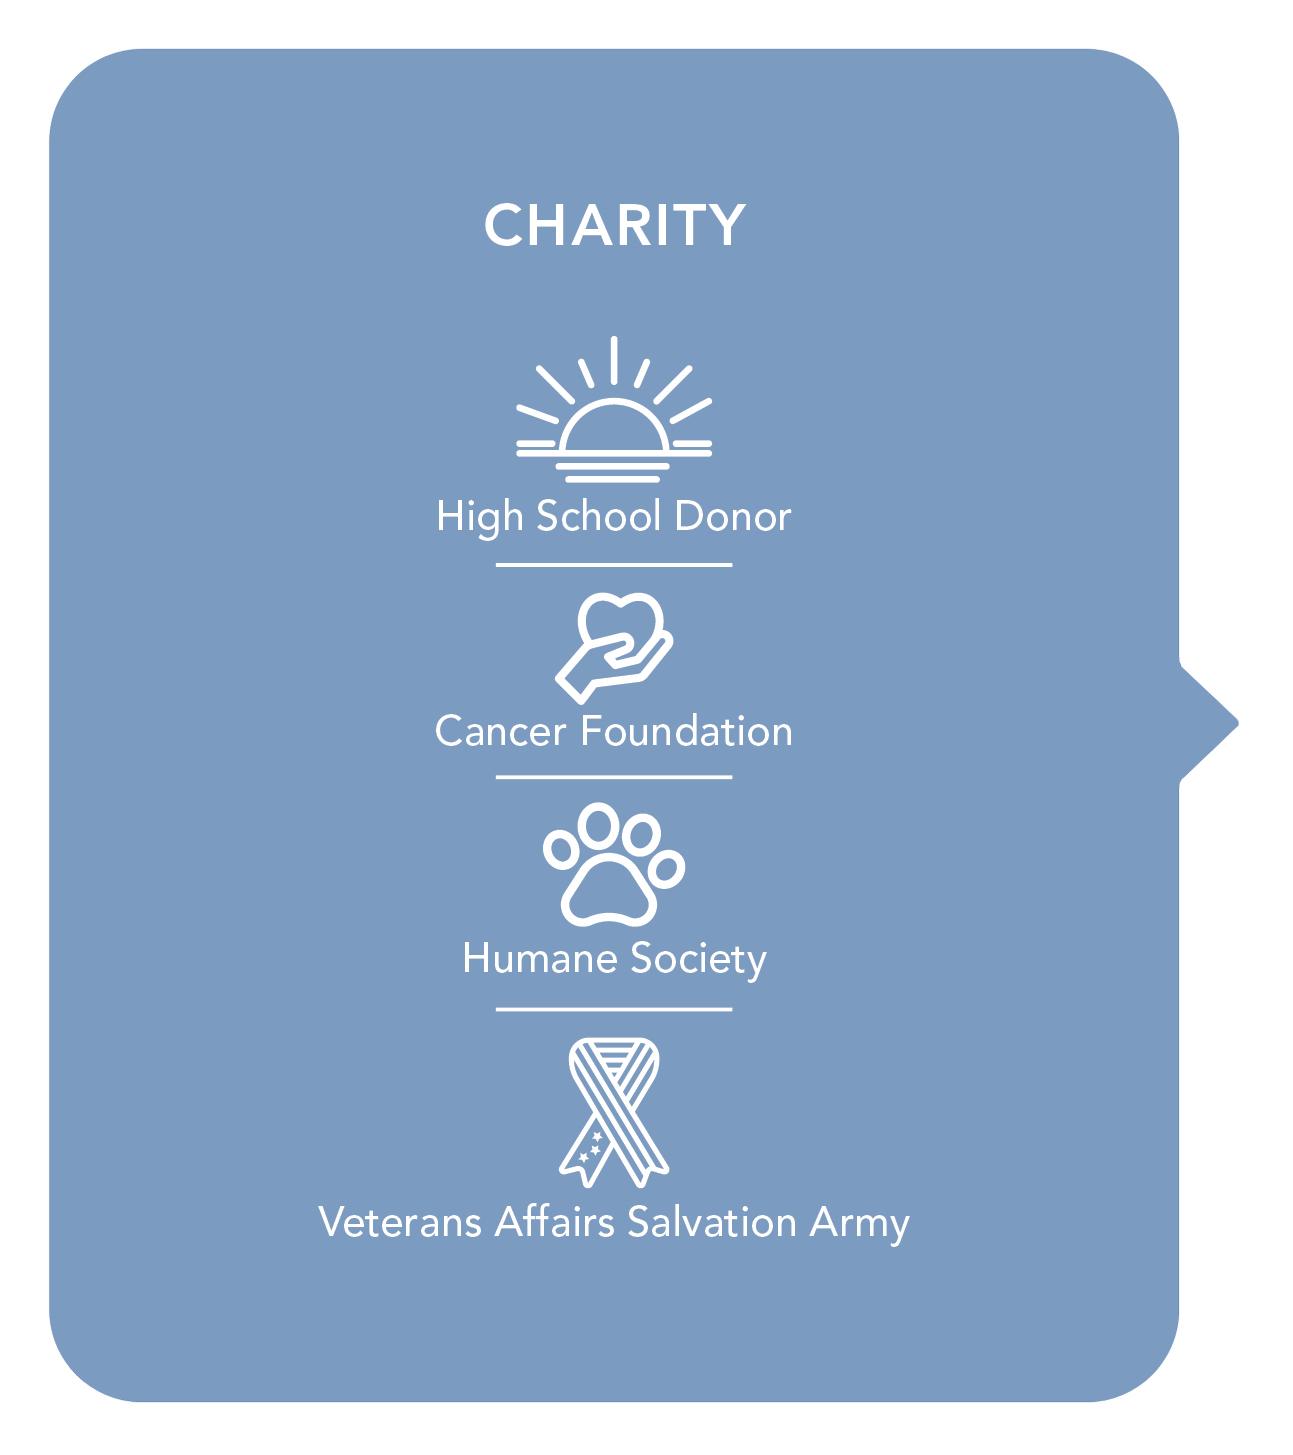 6-charity.jpg[80].jpg